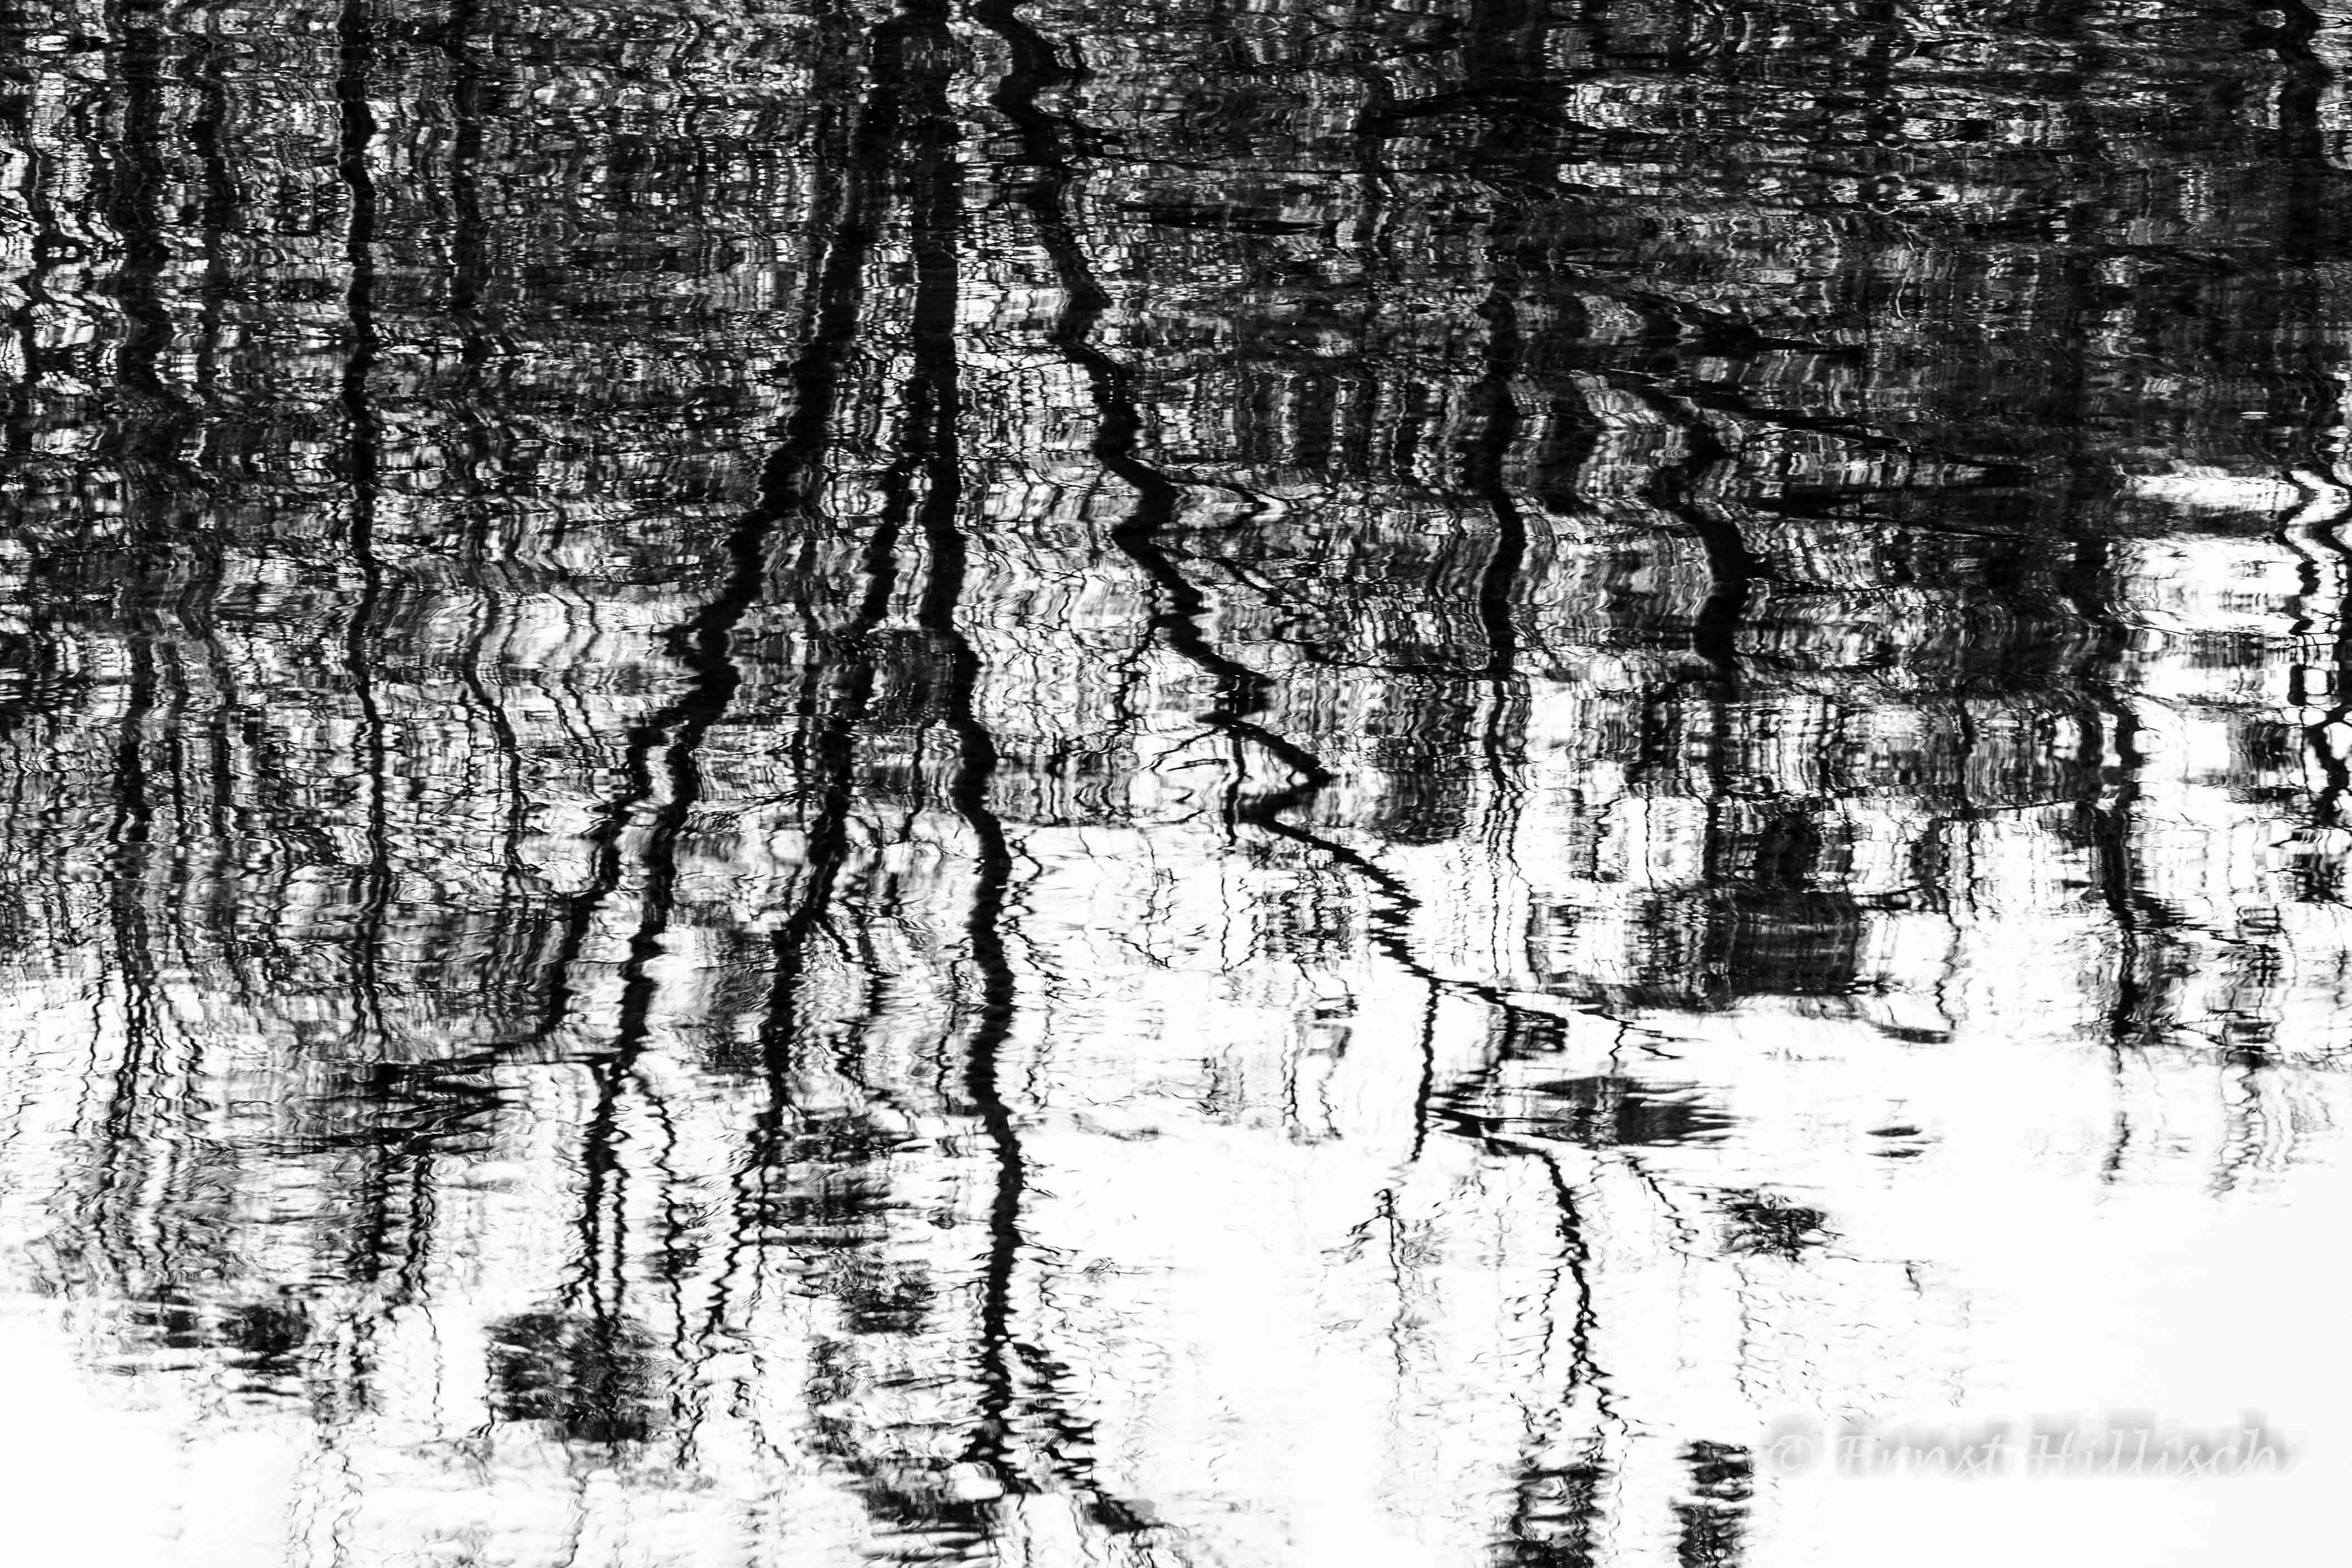 Untitled 3